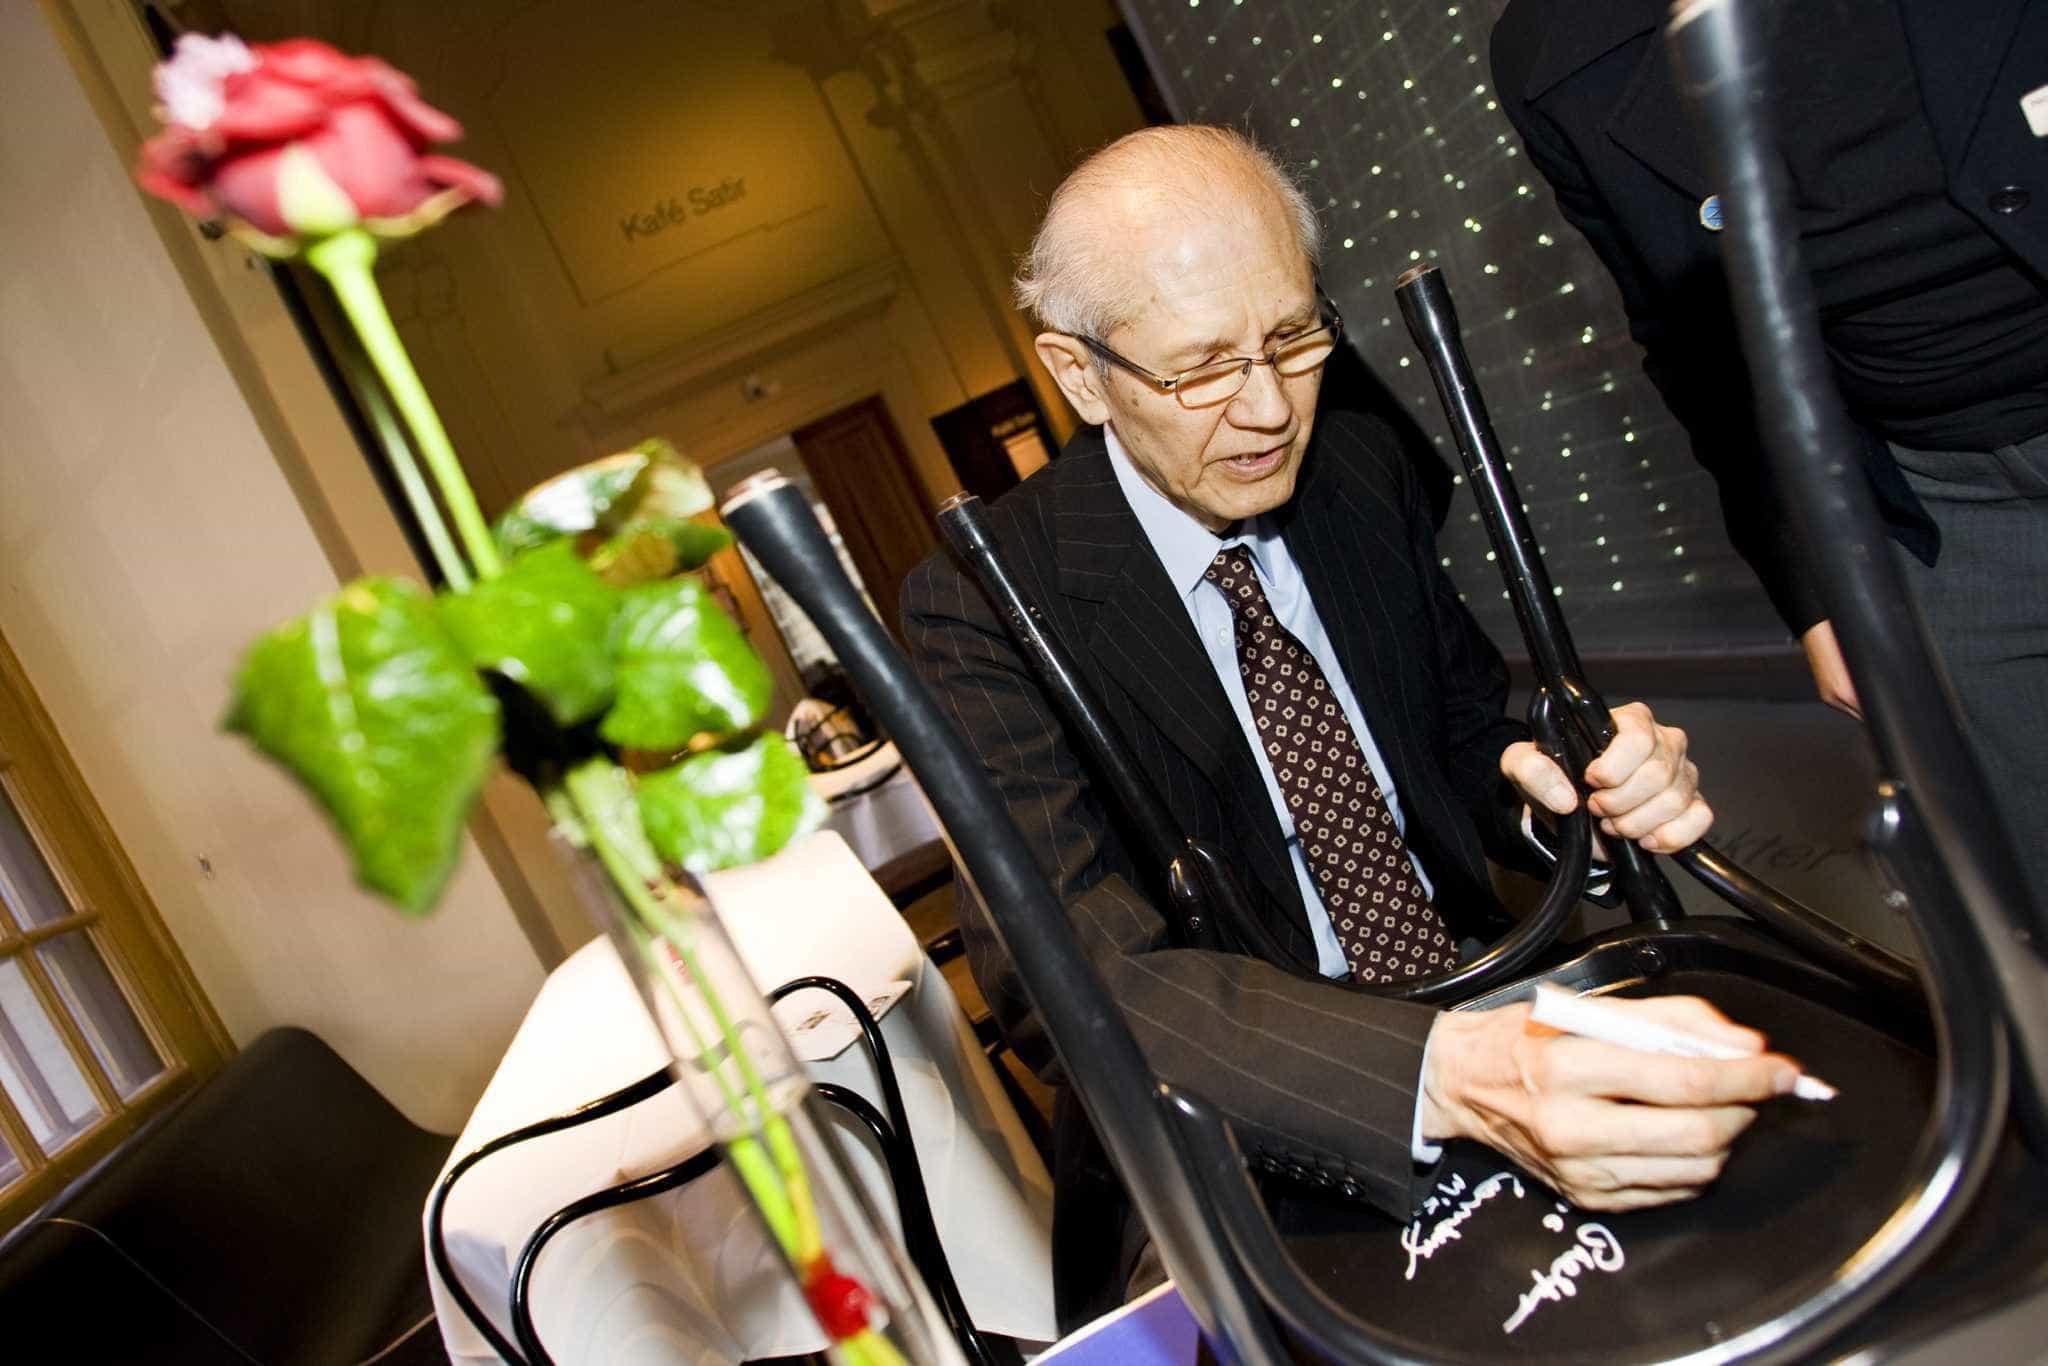 Morre aos 90 anos Nobel de Química Osamu Shimomura